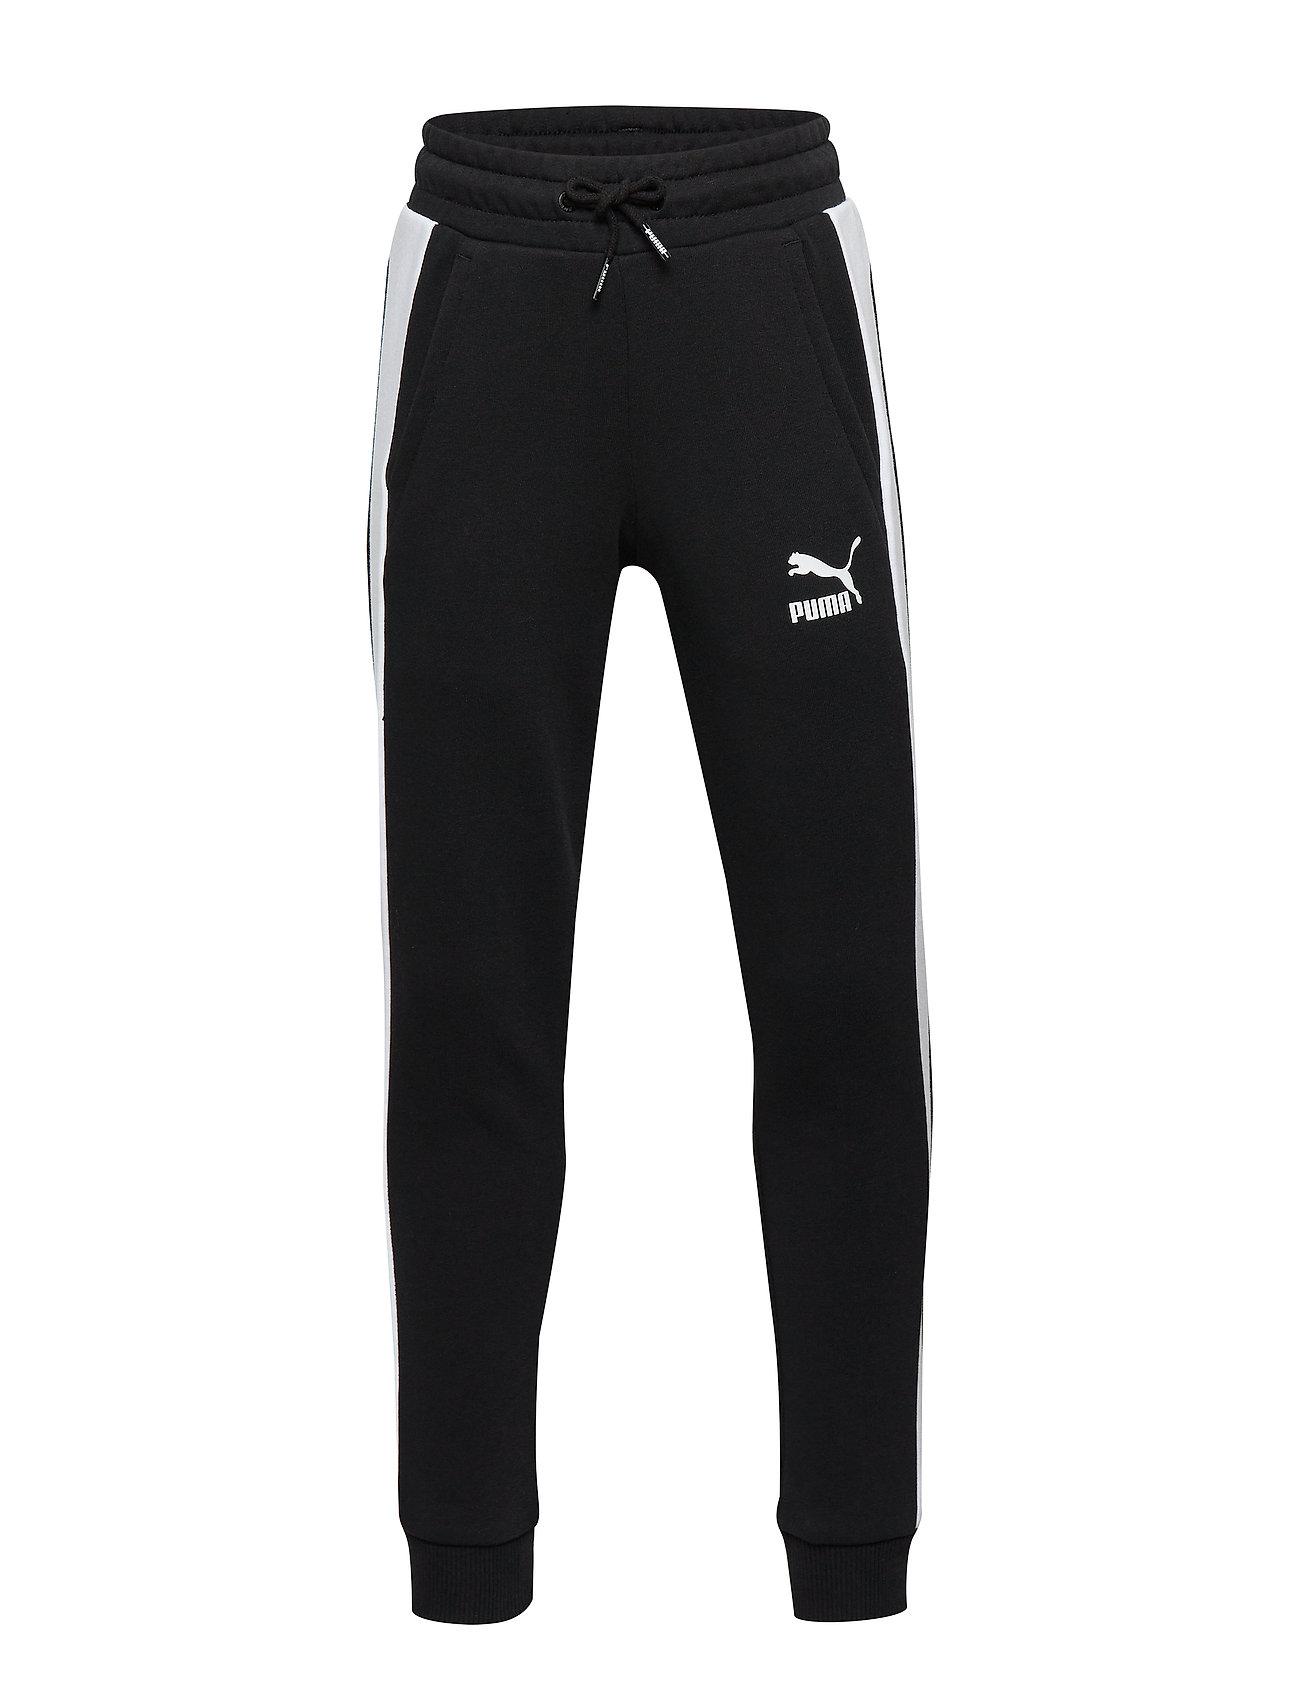 PUMA Classics T7 Sweat Pants G - PUMA BLACK